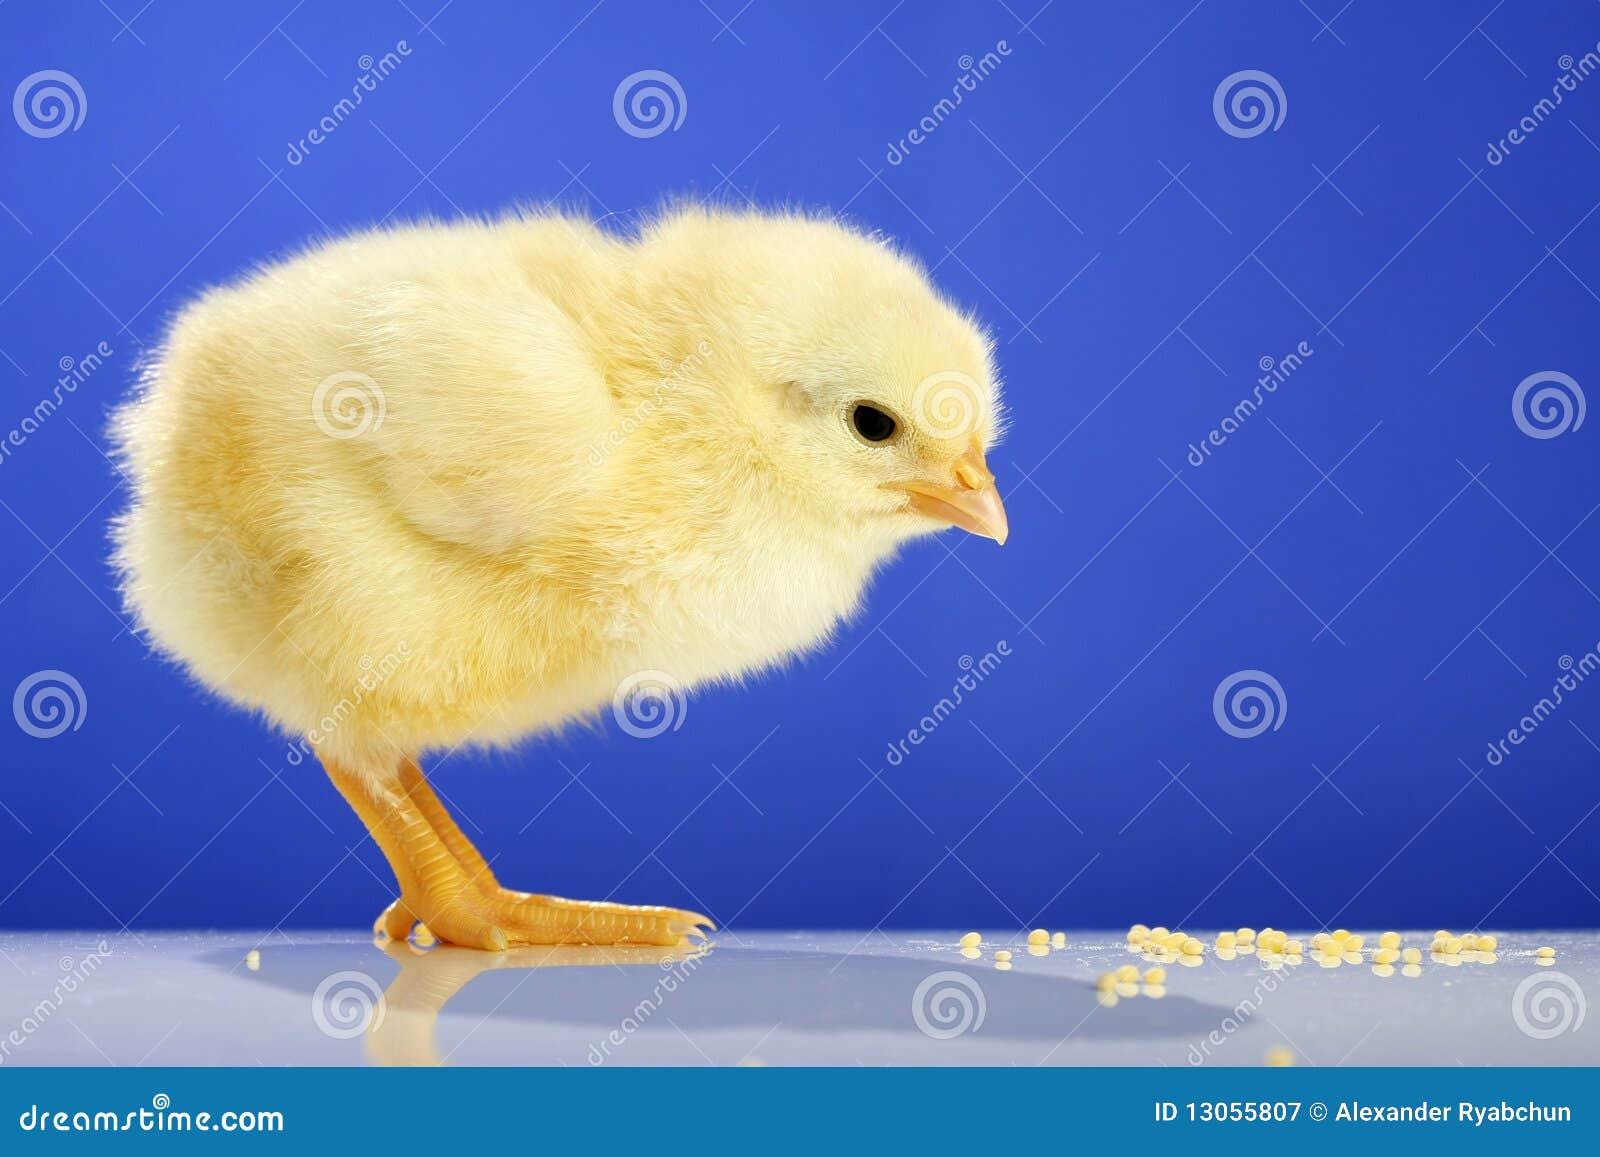 Dziecko kurczak